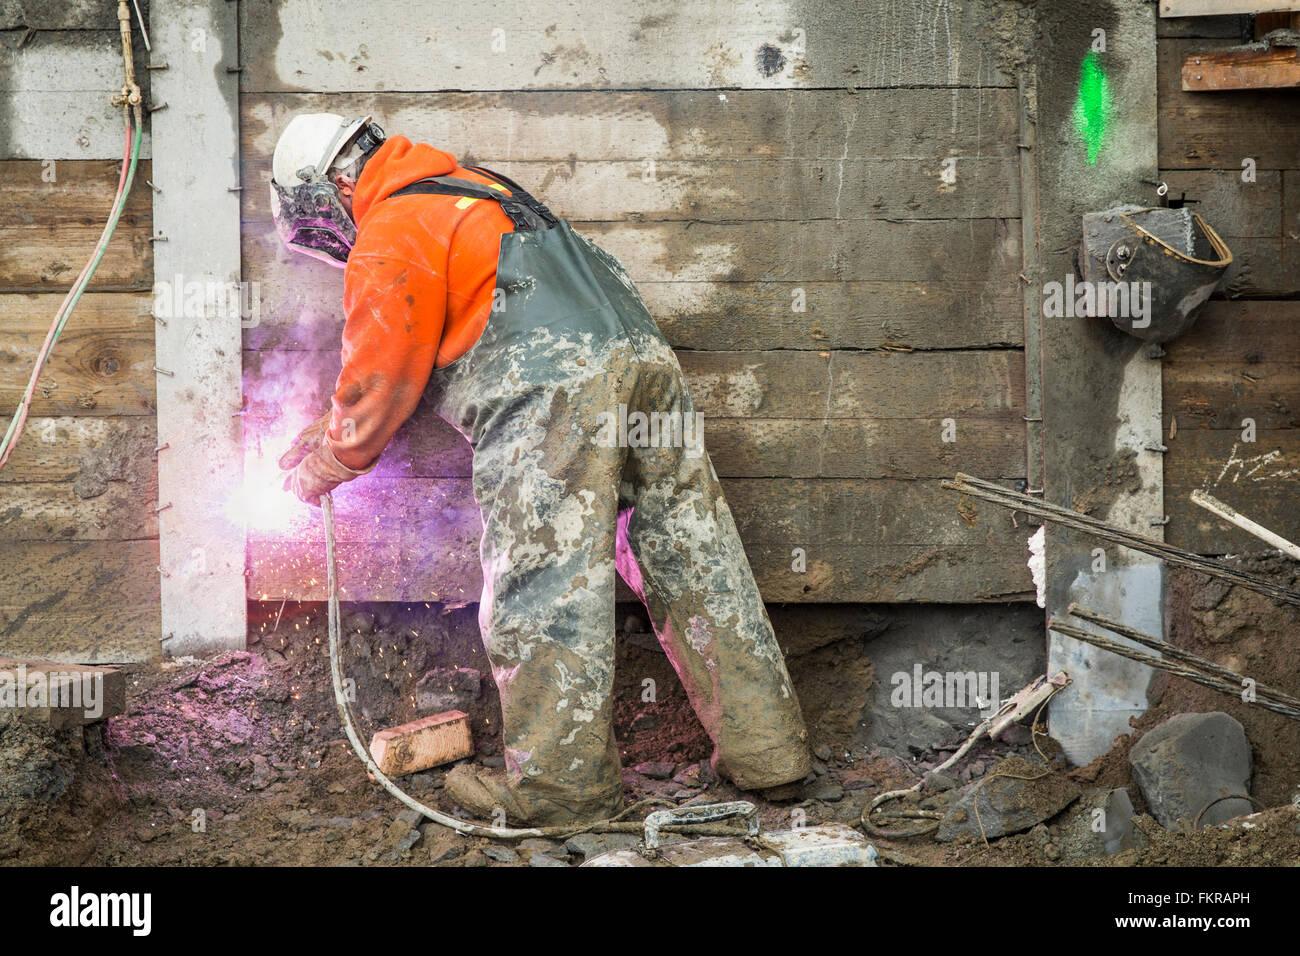 Caucasian worker welding at construction site Banque D'Images